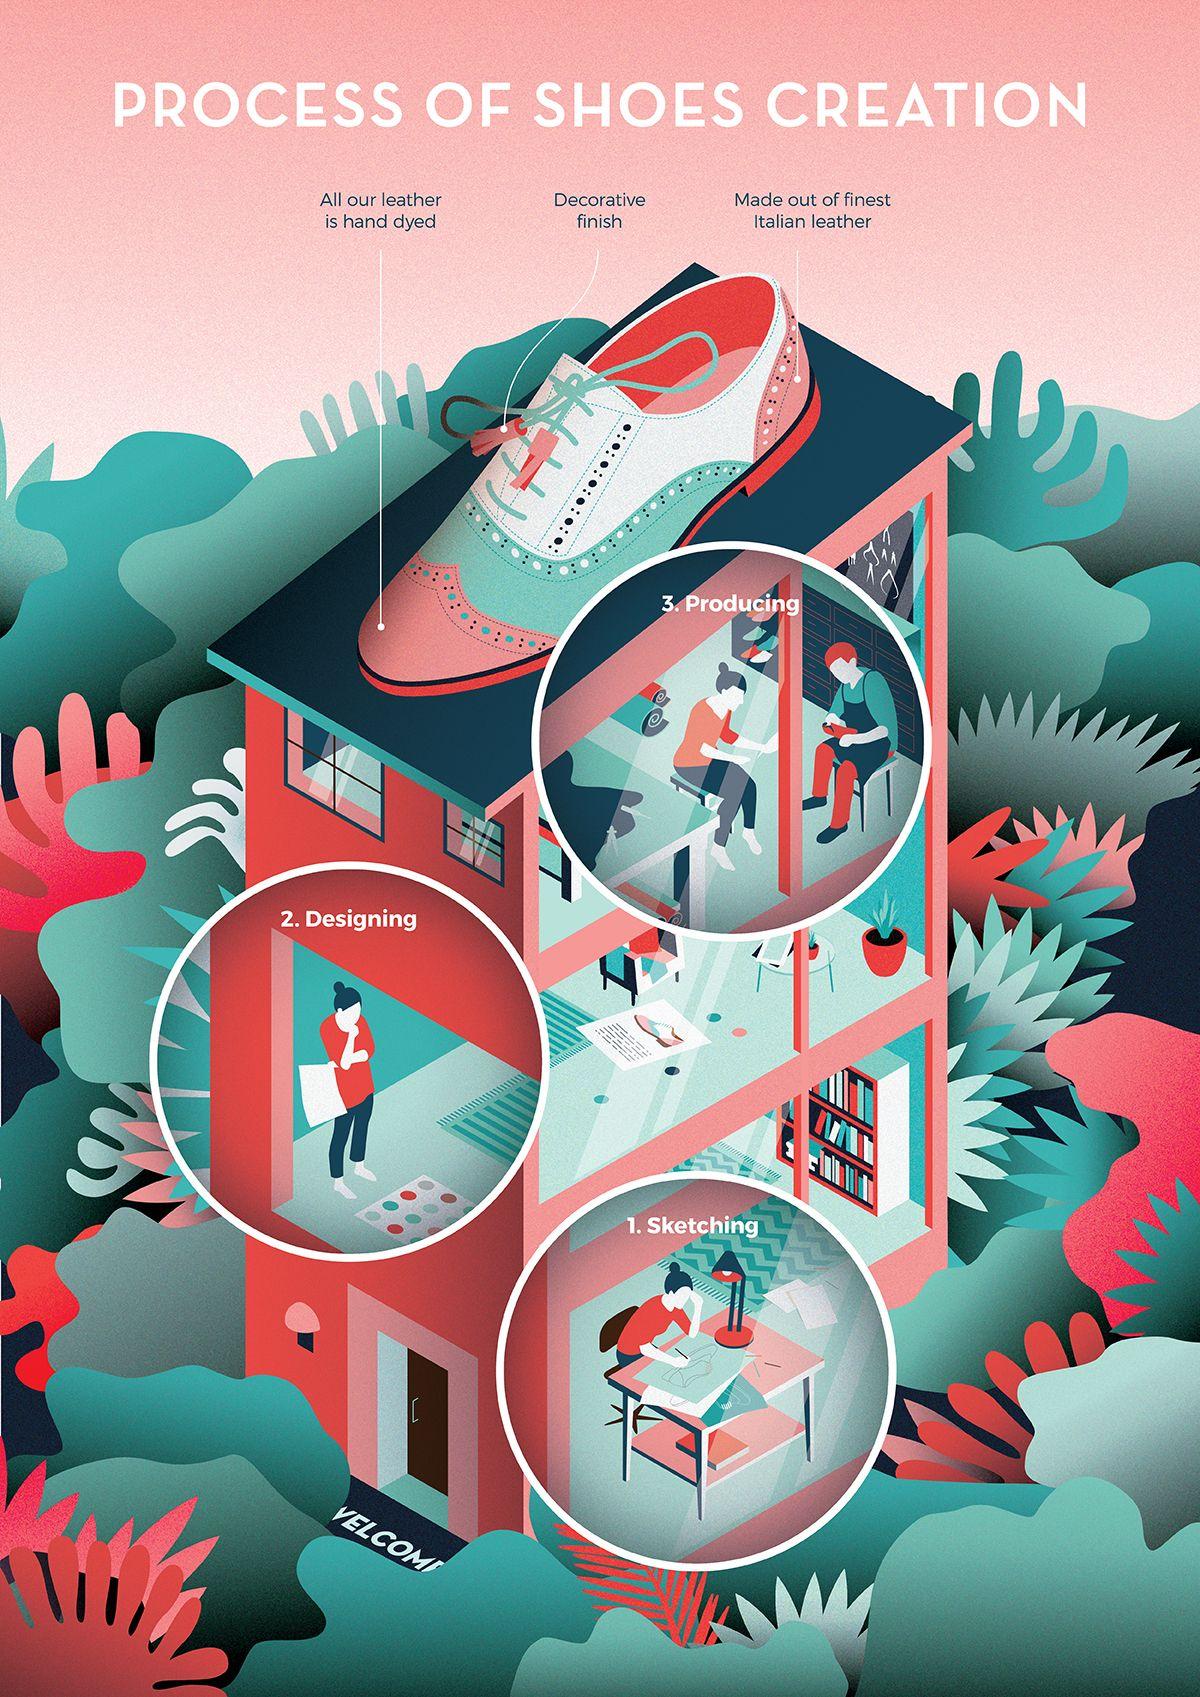 Illustration For A Small Company, Describing The Process